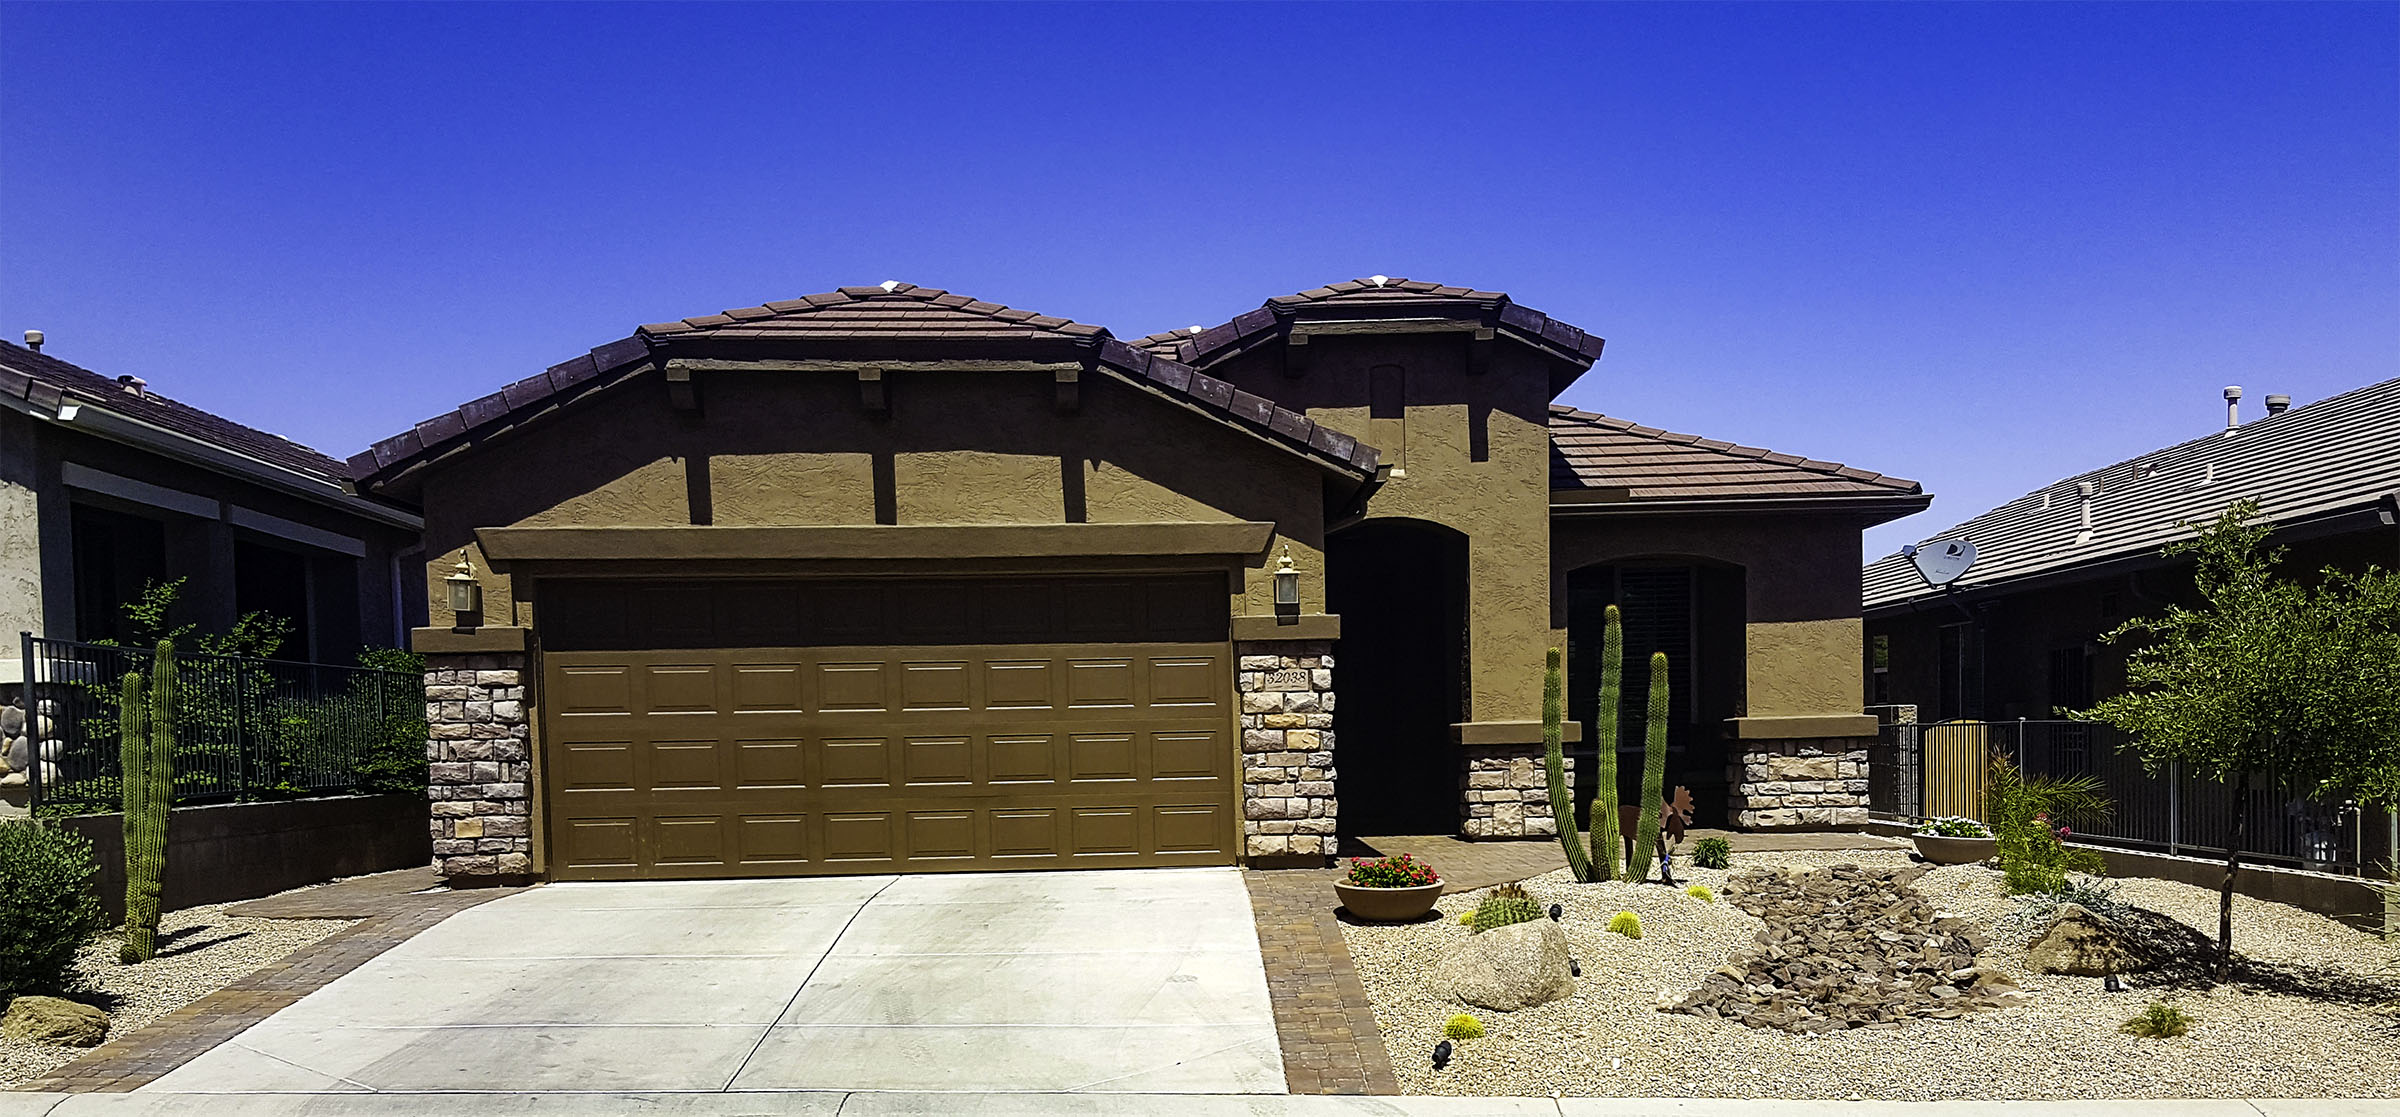 Arizona desert landscape design with riverbeds, rock, plants on Best Yard Design id=40702